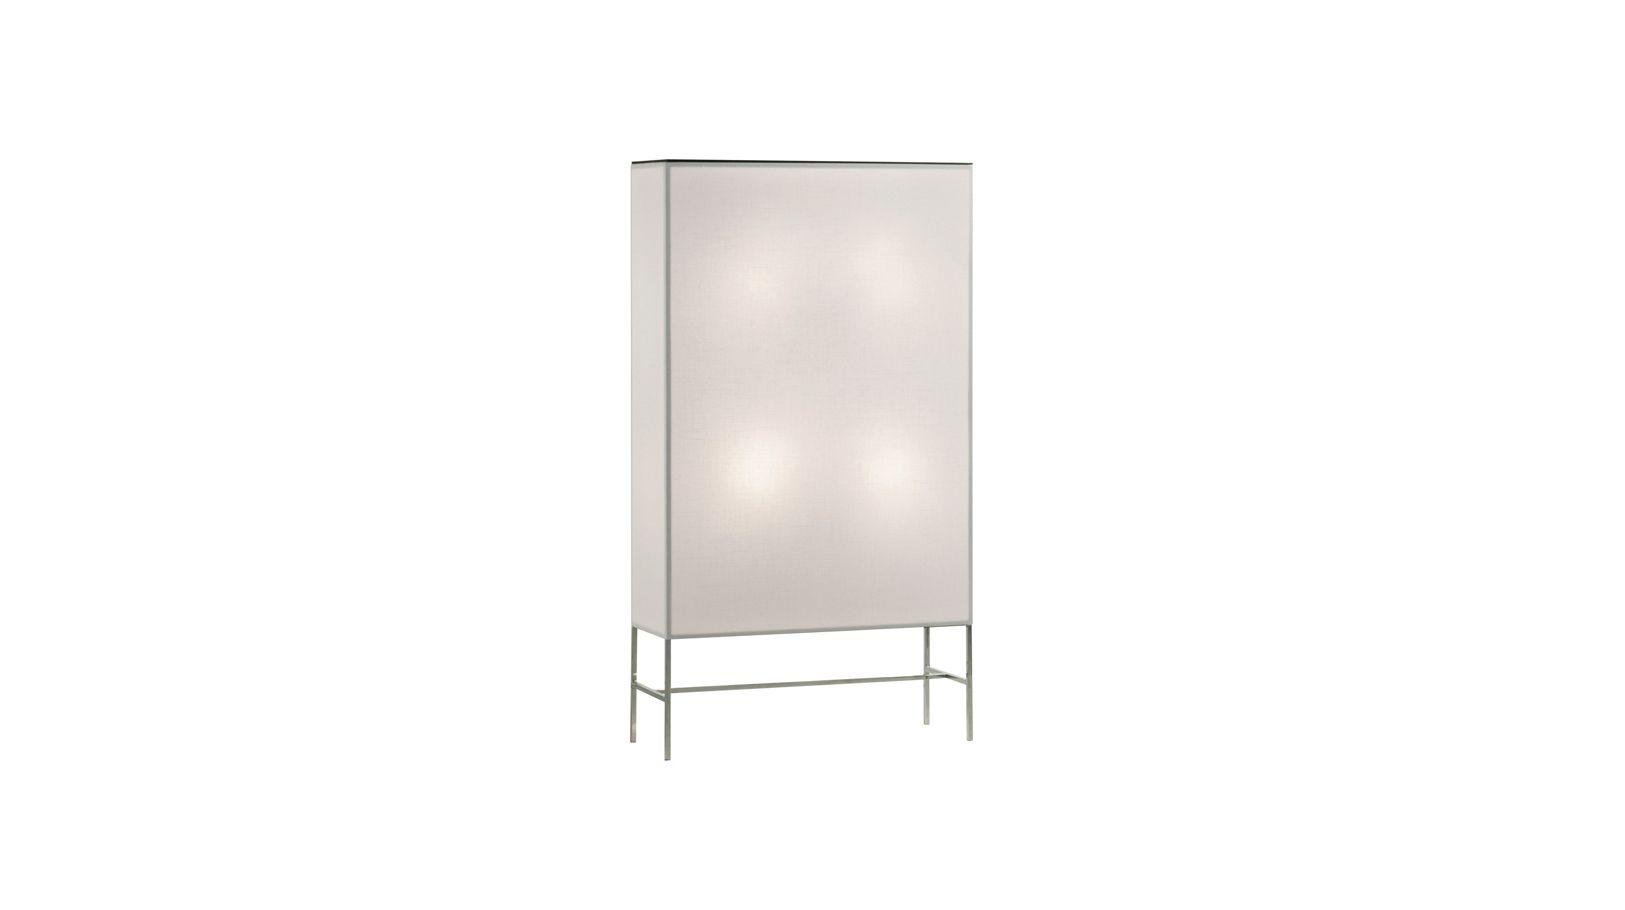 luminara lampada orizzontale luminara roche bobois. Black Bedroom Furniture Sets. Home Design Ideas